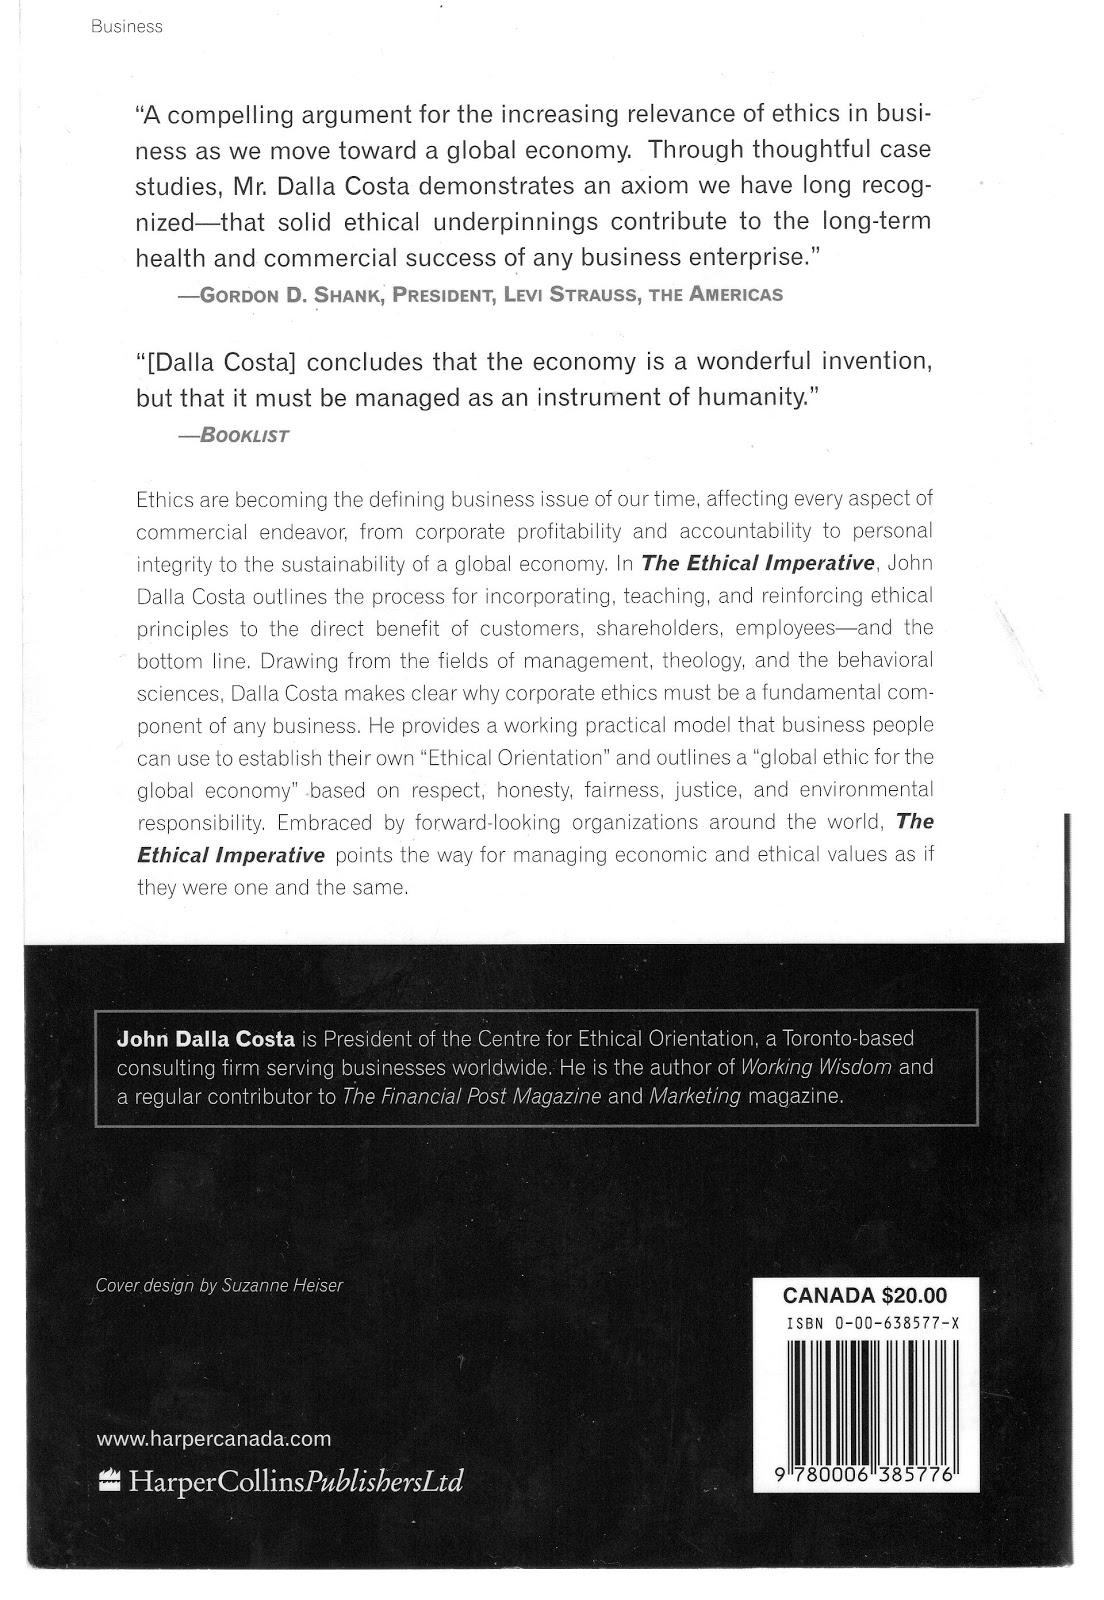 the paradigm of enterprise inns Expert witnesses in premises liability cases andrew b sommerman sommerman & quesada, llp 3811 turtle creek boulevard, suite 1400 dallas, texas 75219-4461.